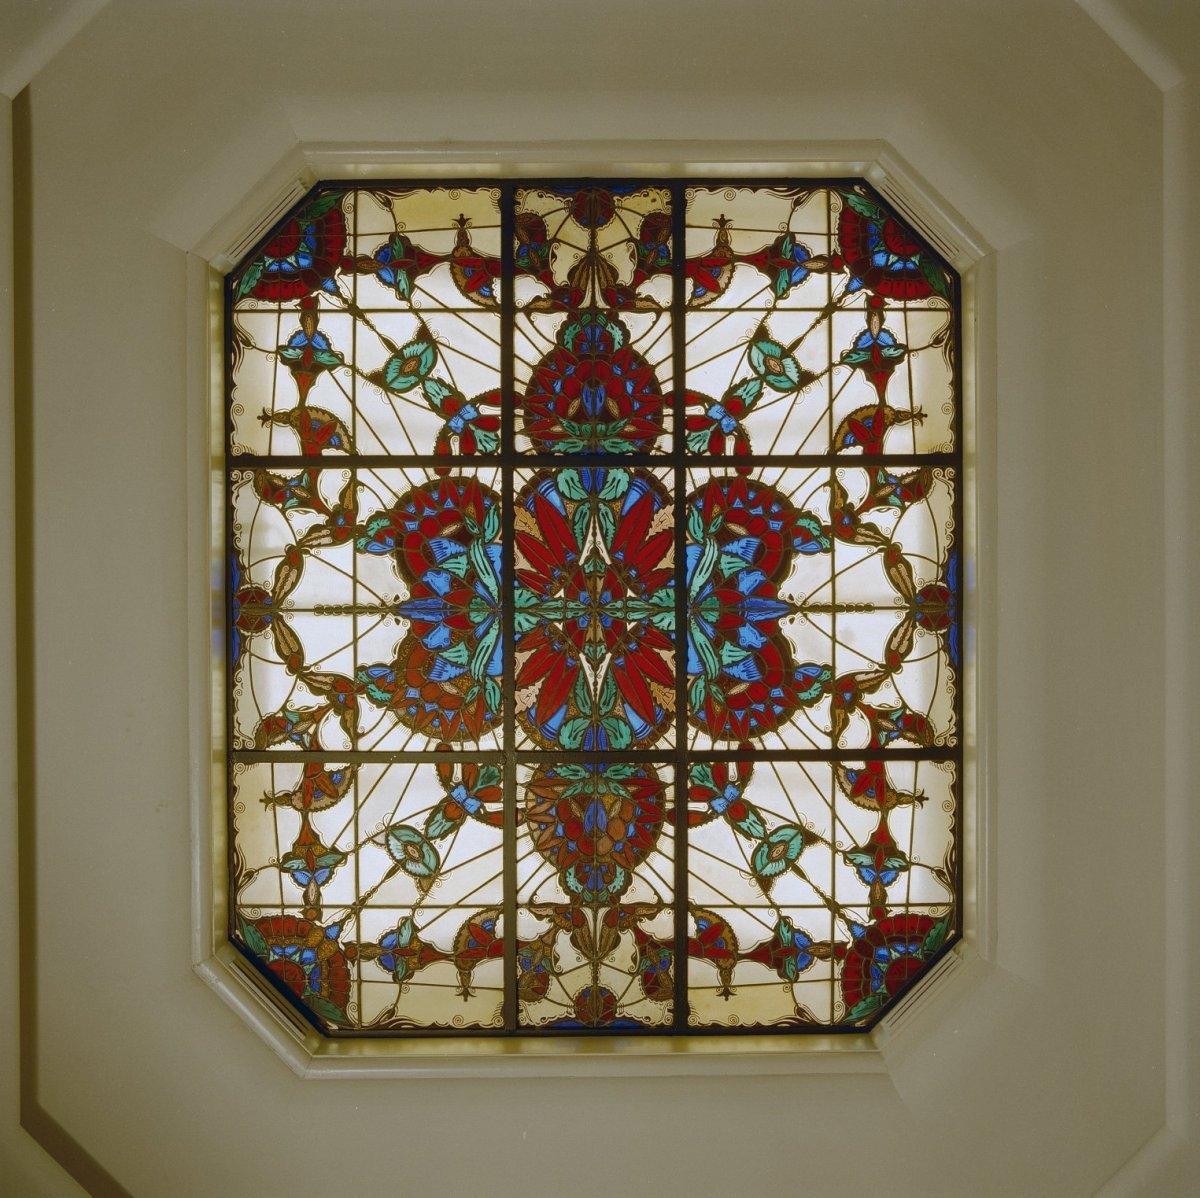 file interieur badkamer art deco plafond raam den dolder 20280122 wikimedia. Black Bedroom Furniture Sets. Home Design Ideas